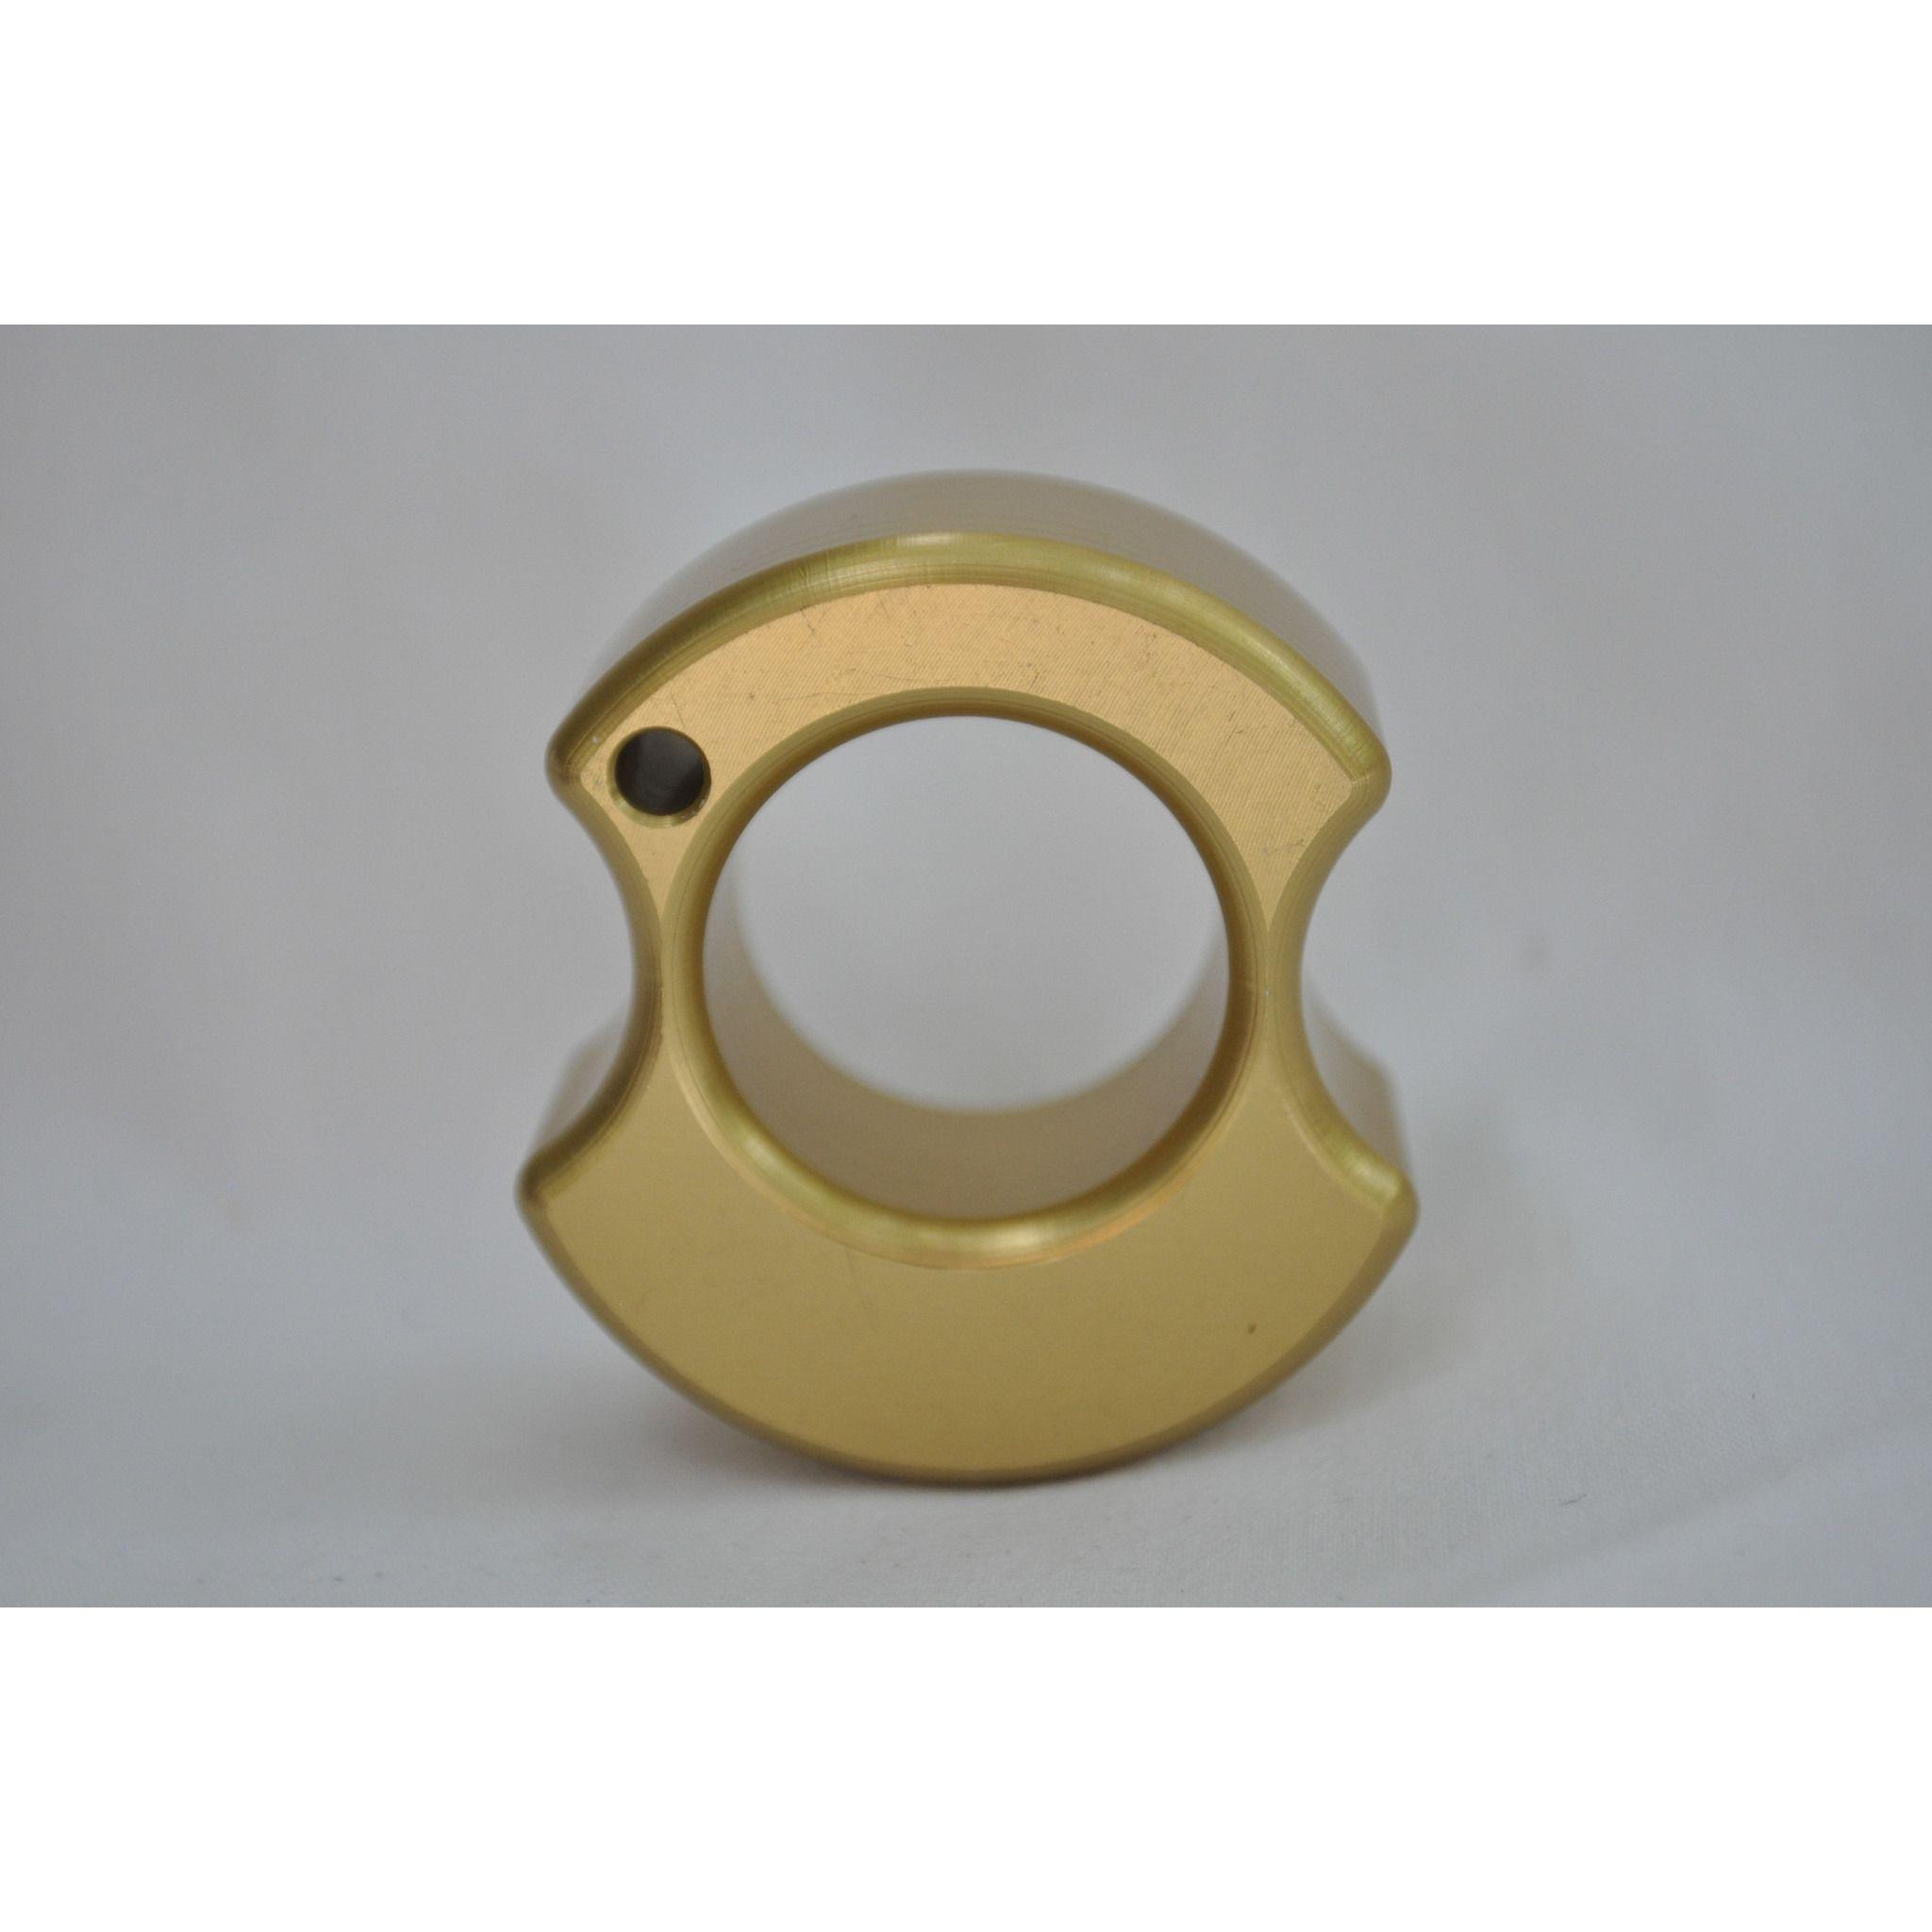 Juke Gold Anodized Self Defense Aluminum Tactical Safety